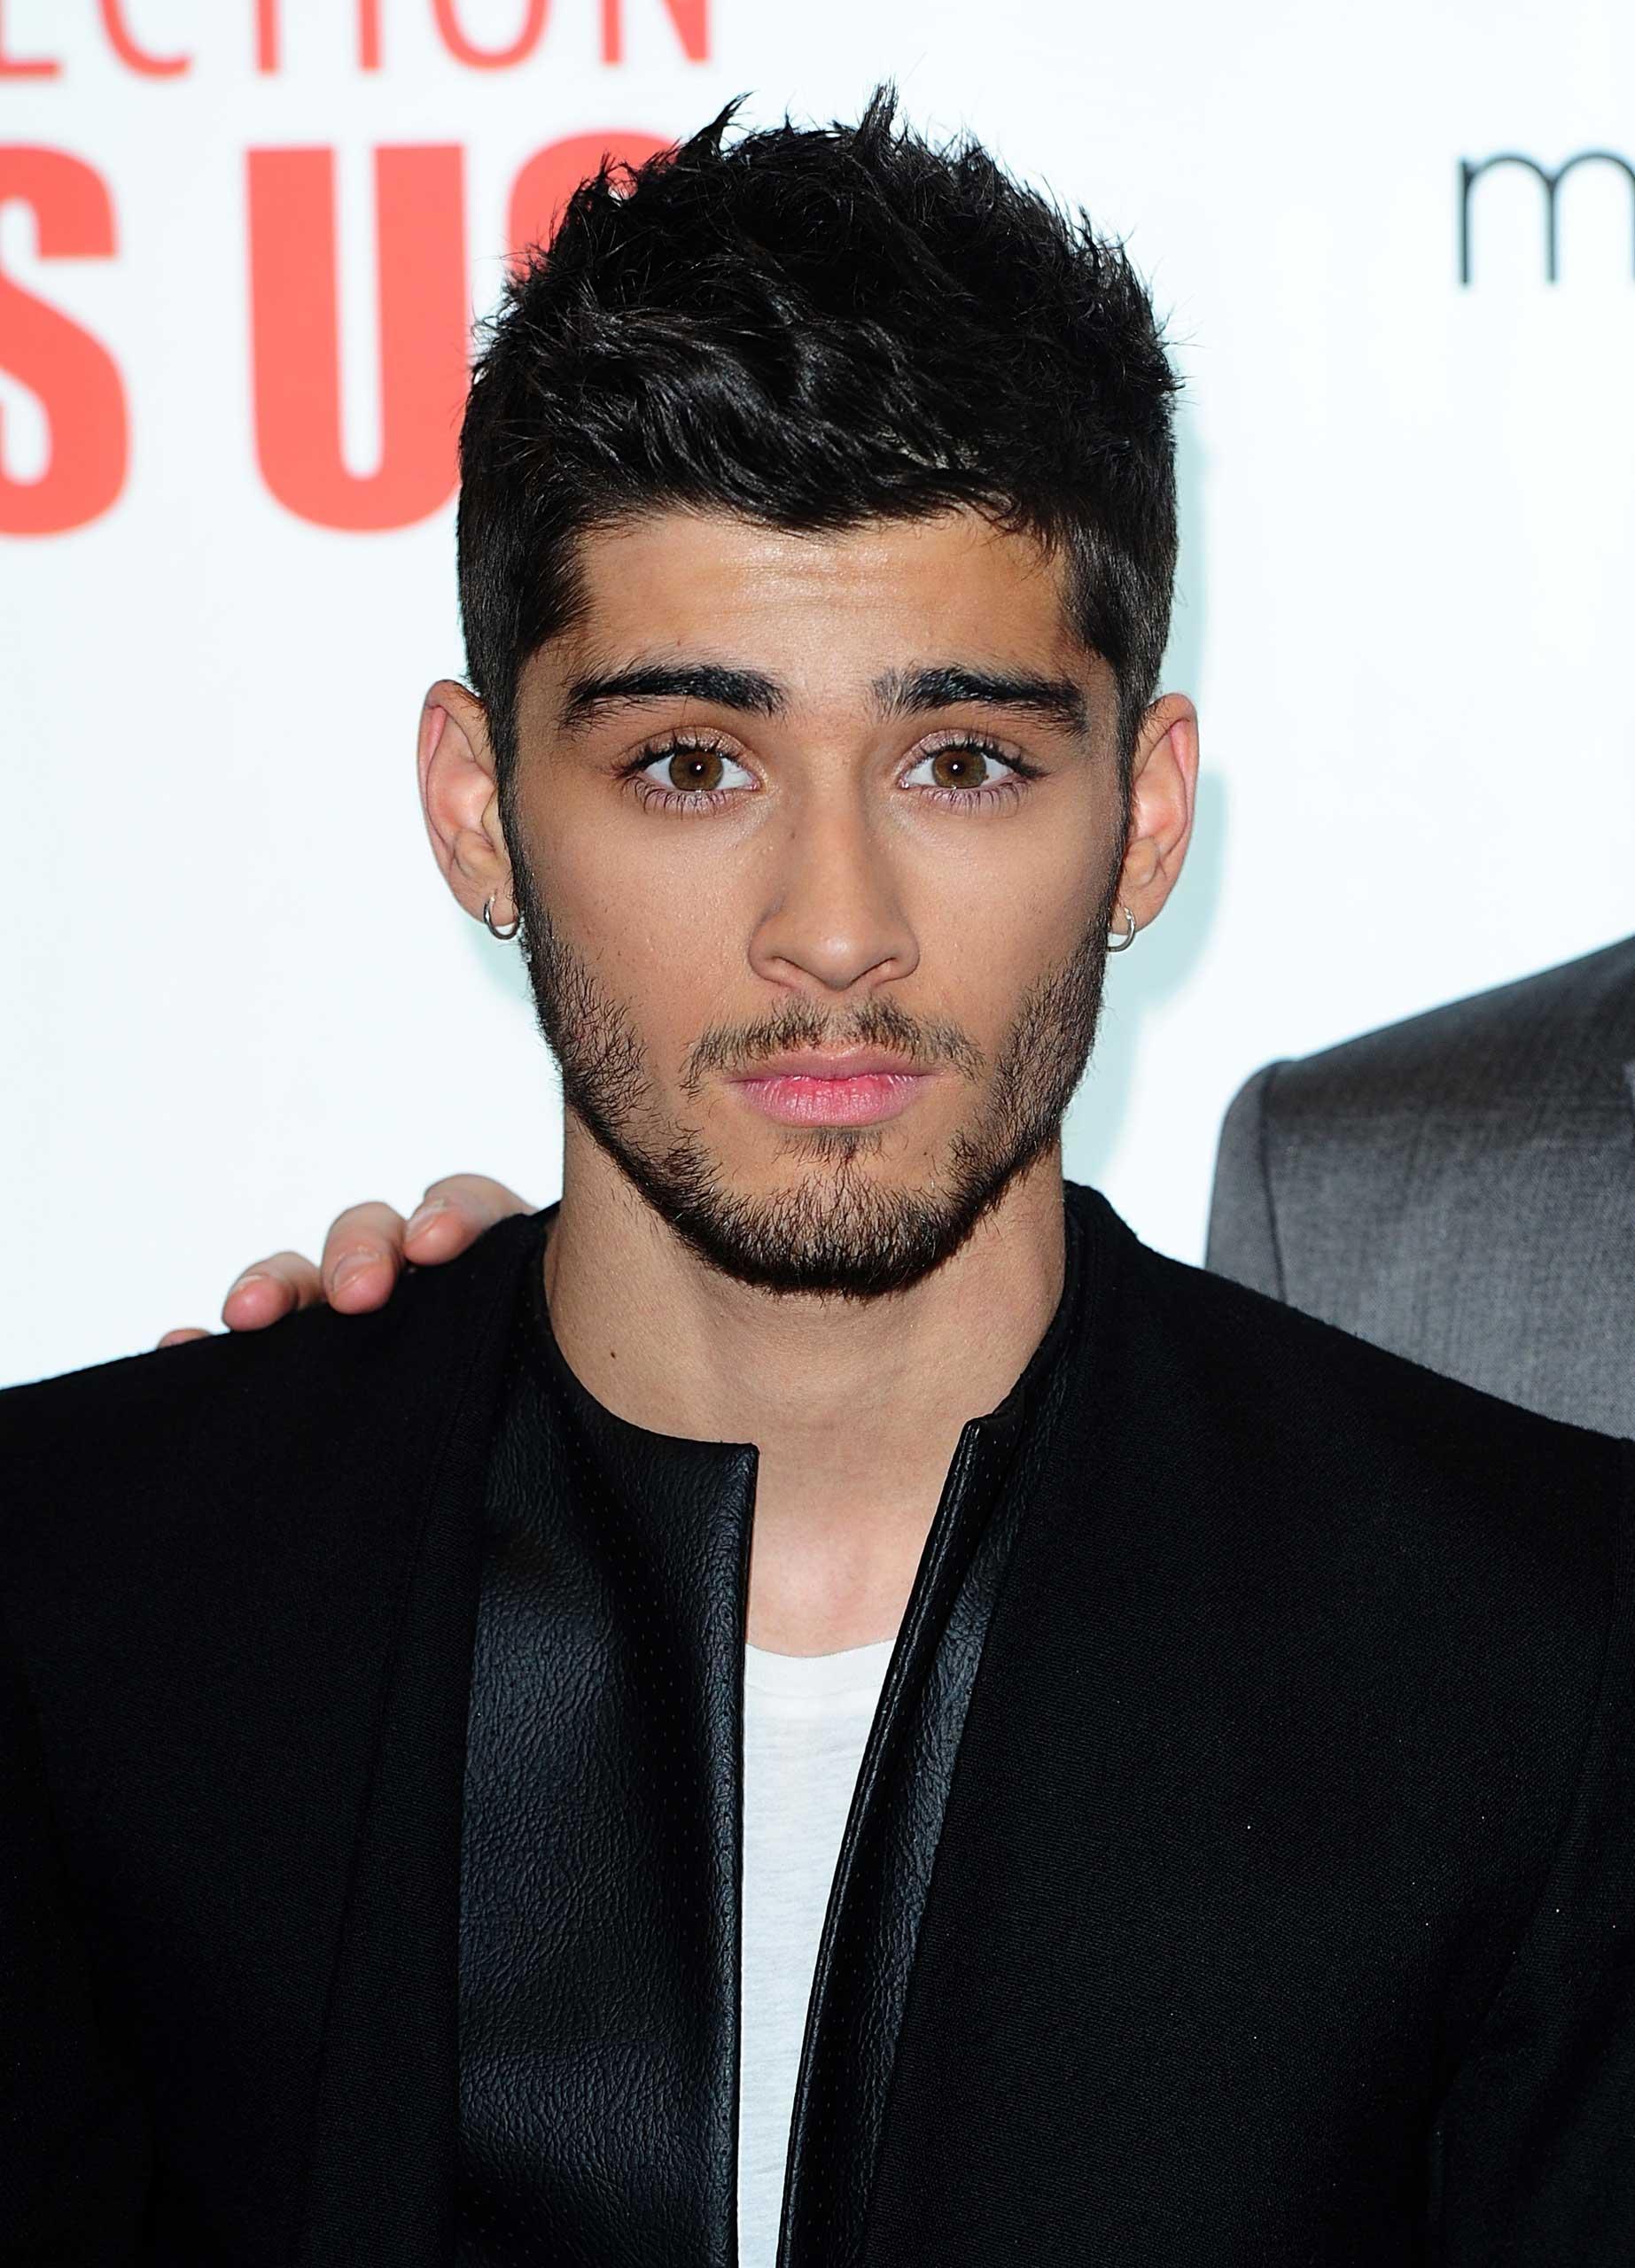 Zayn Malik quits One Direction